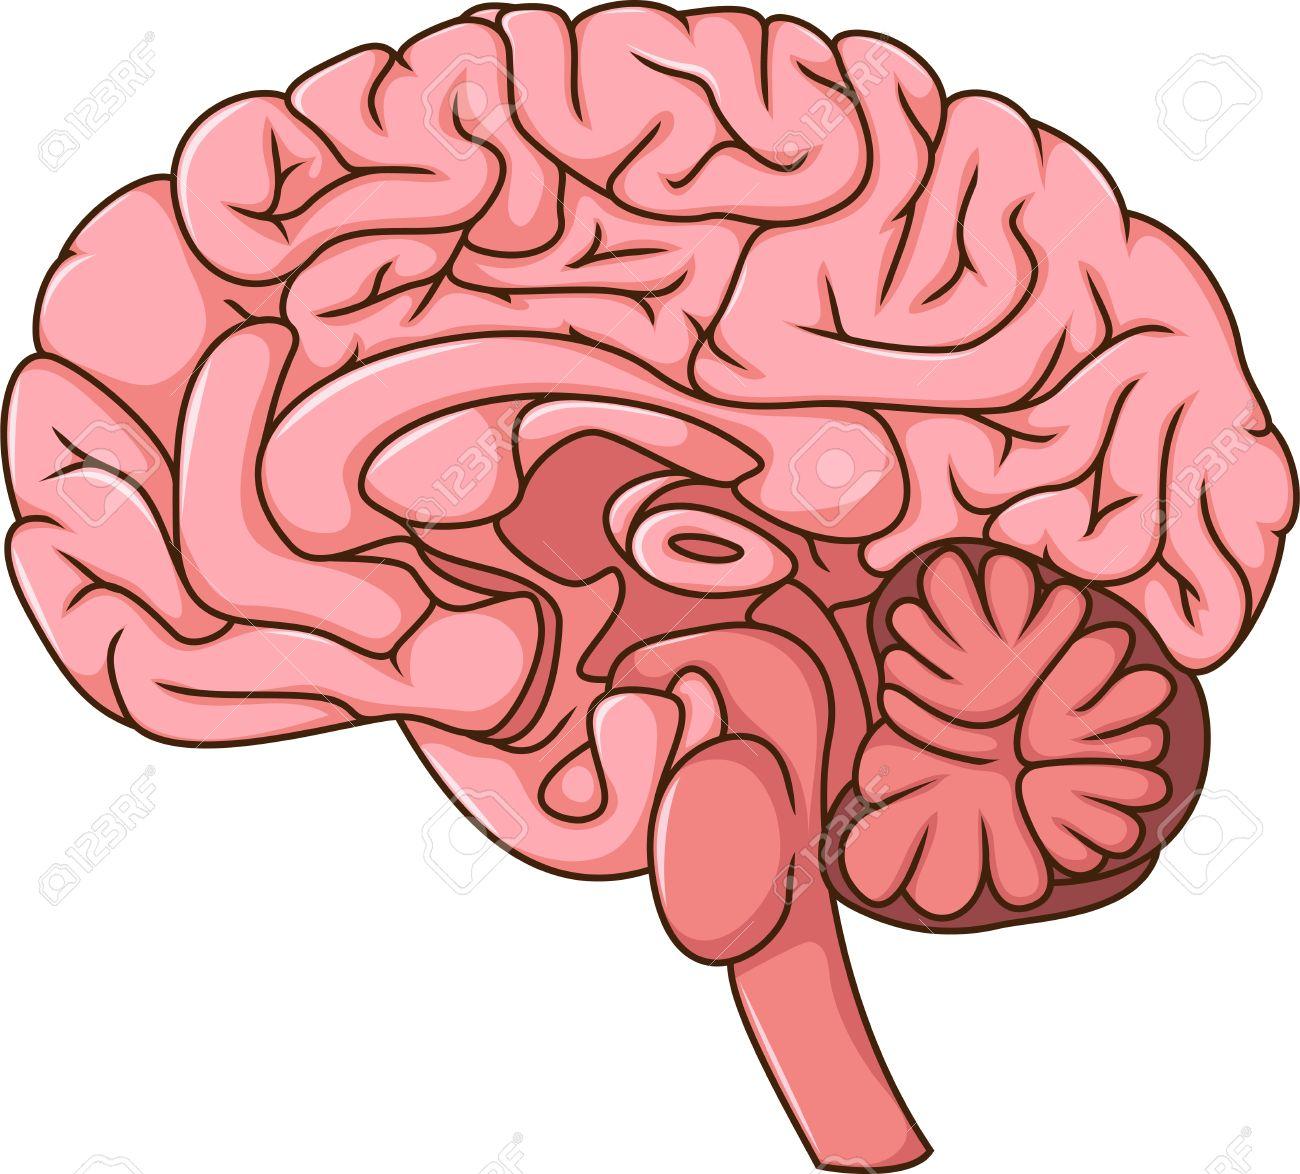 human brain cartoon royalty free cliparts vectors and stock